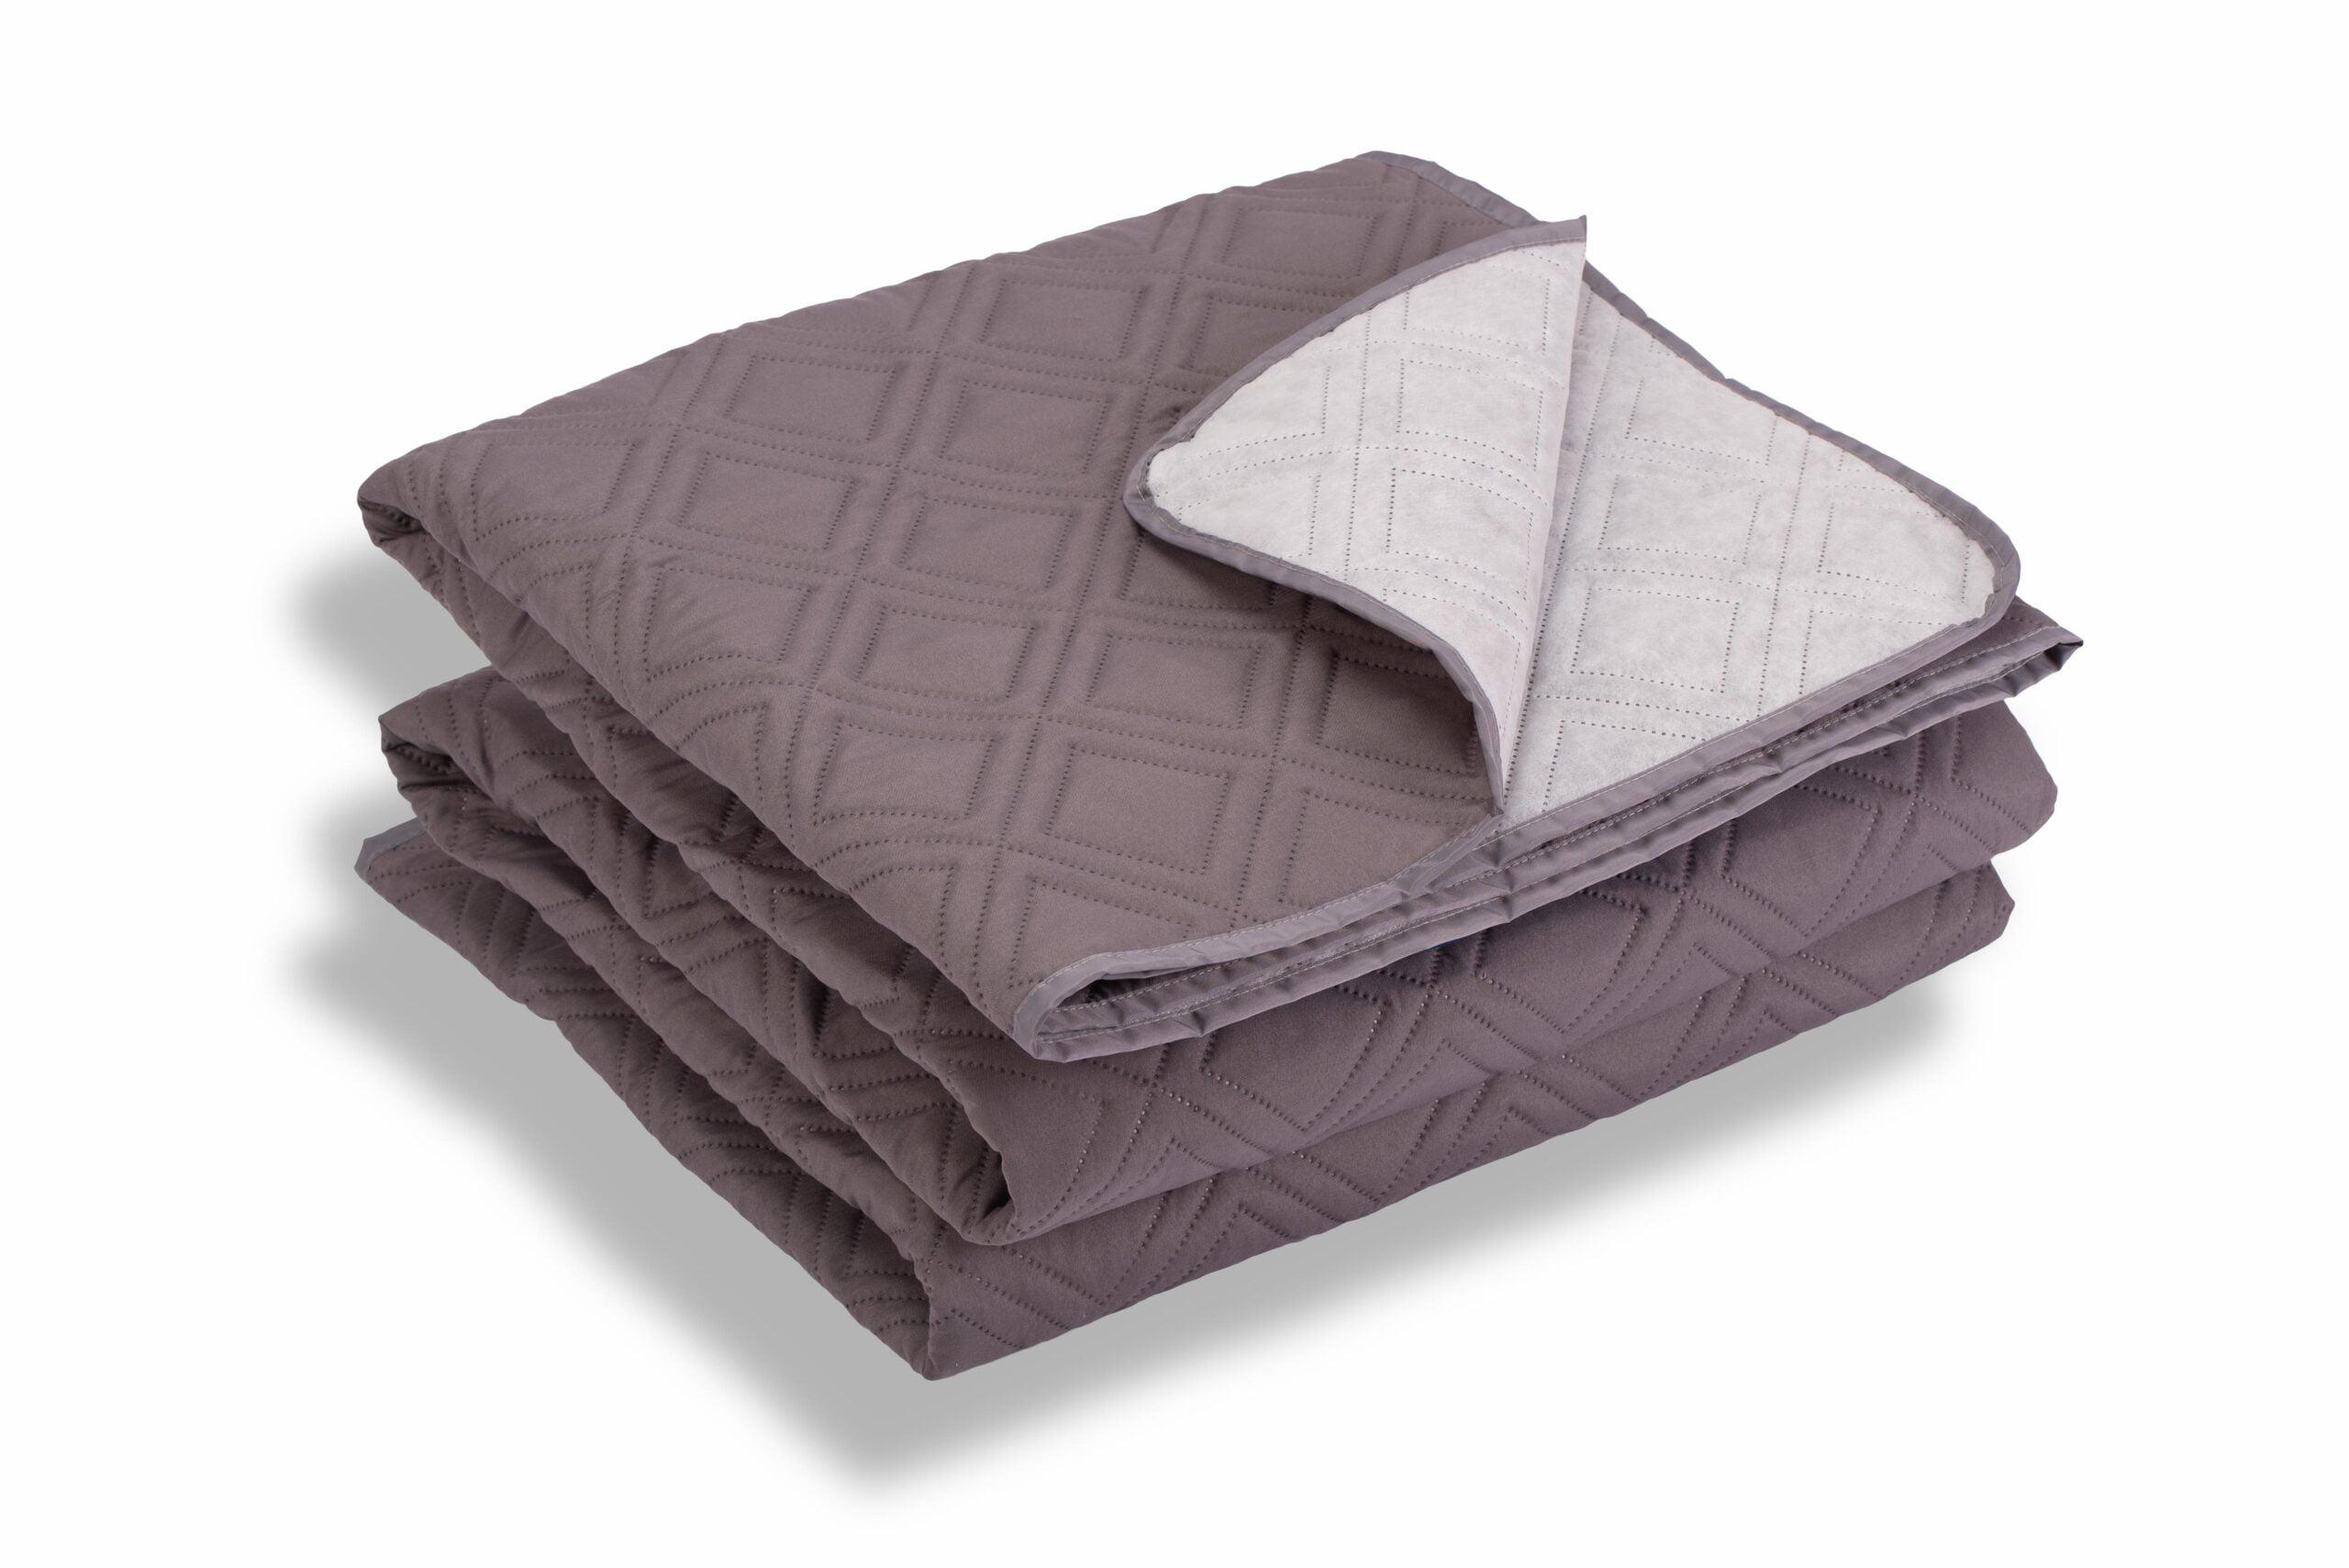 Cuvertura de pat Somnart, gri, microfibra soft-touch, 220X240 cm imagine 2021 somnart.ro